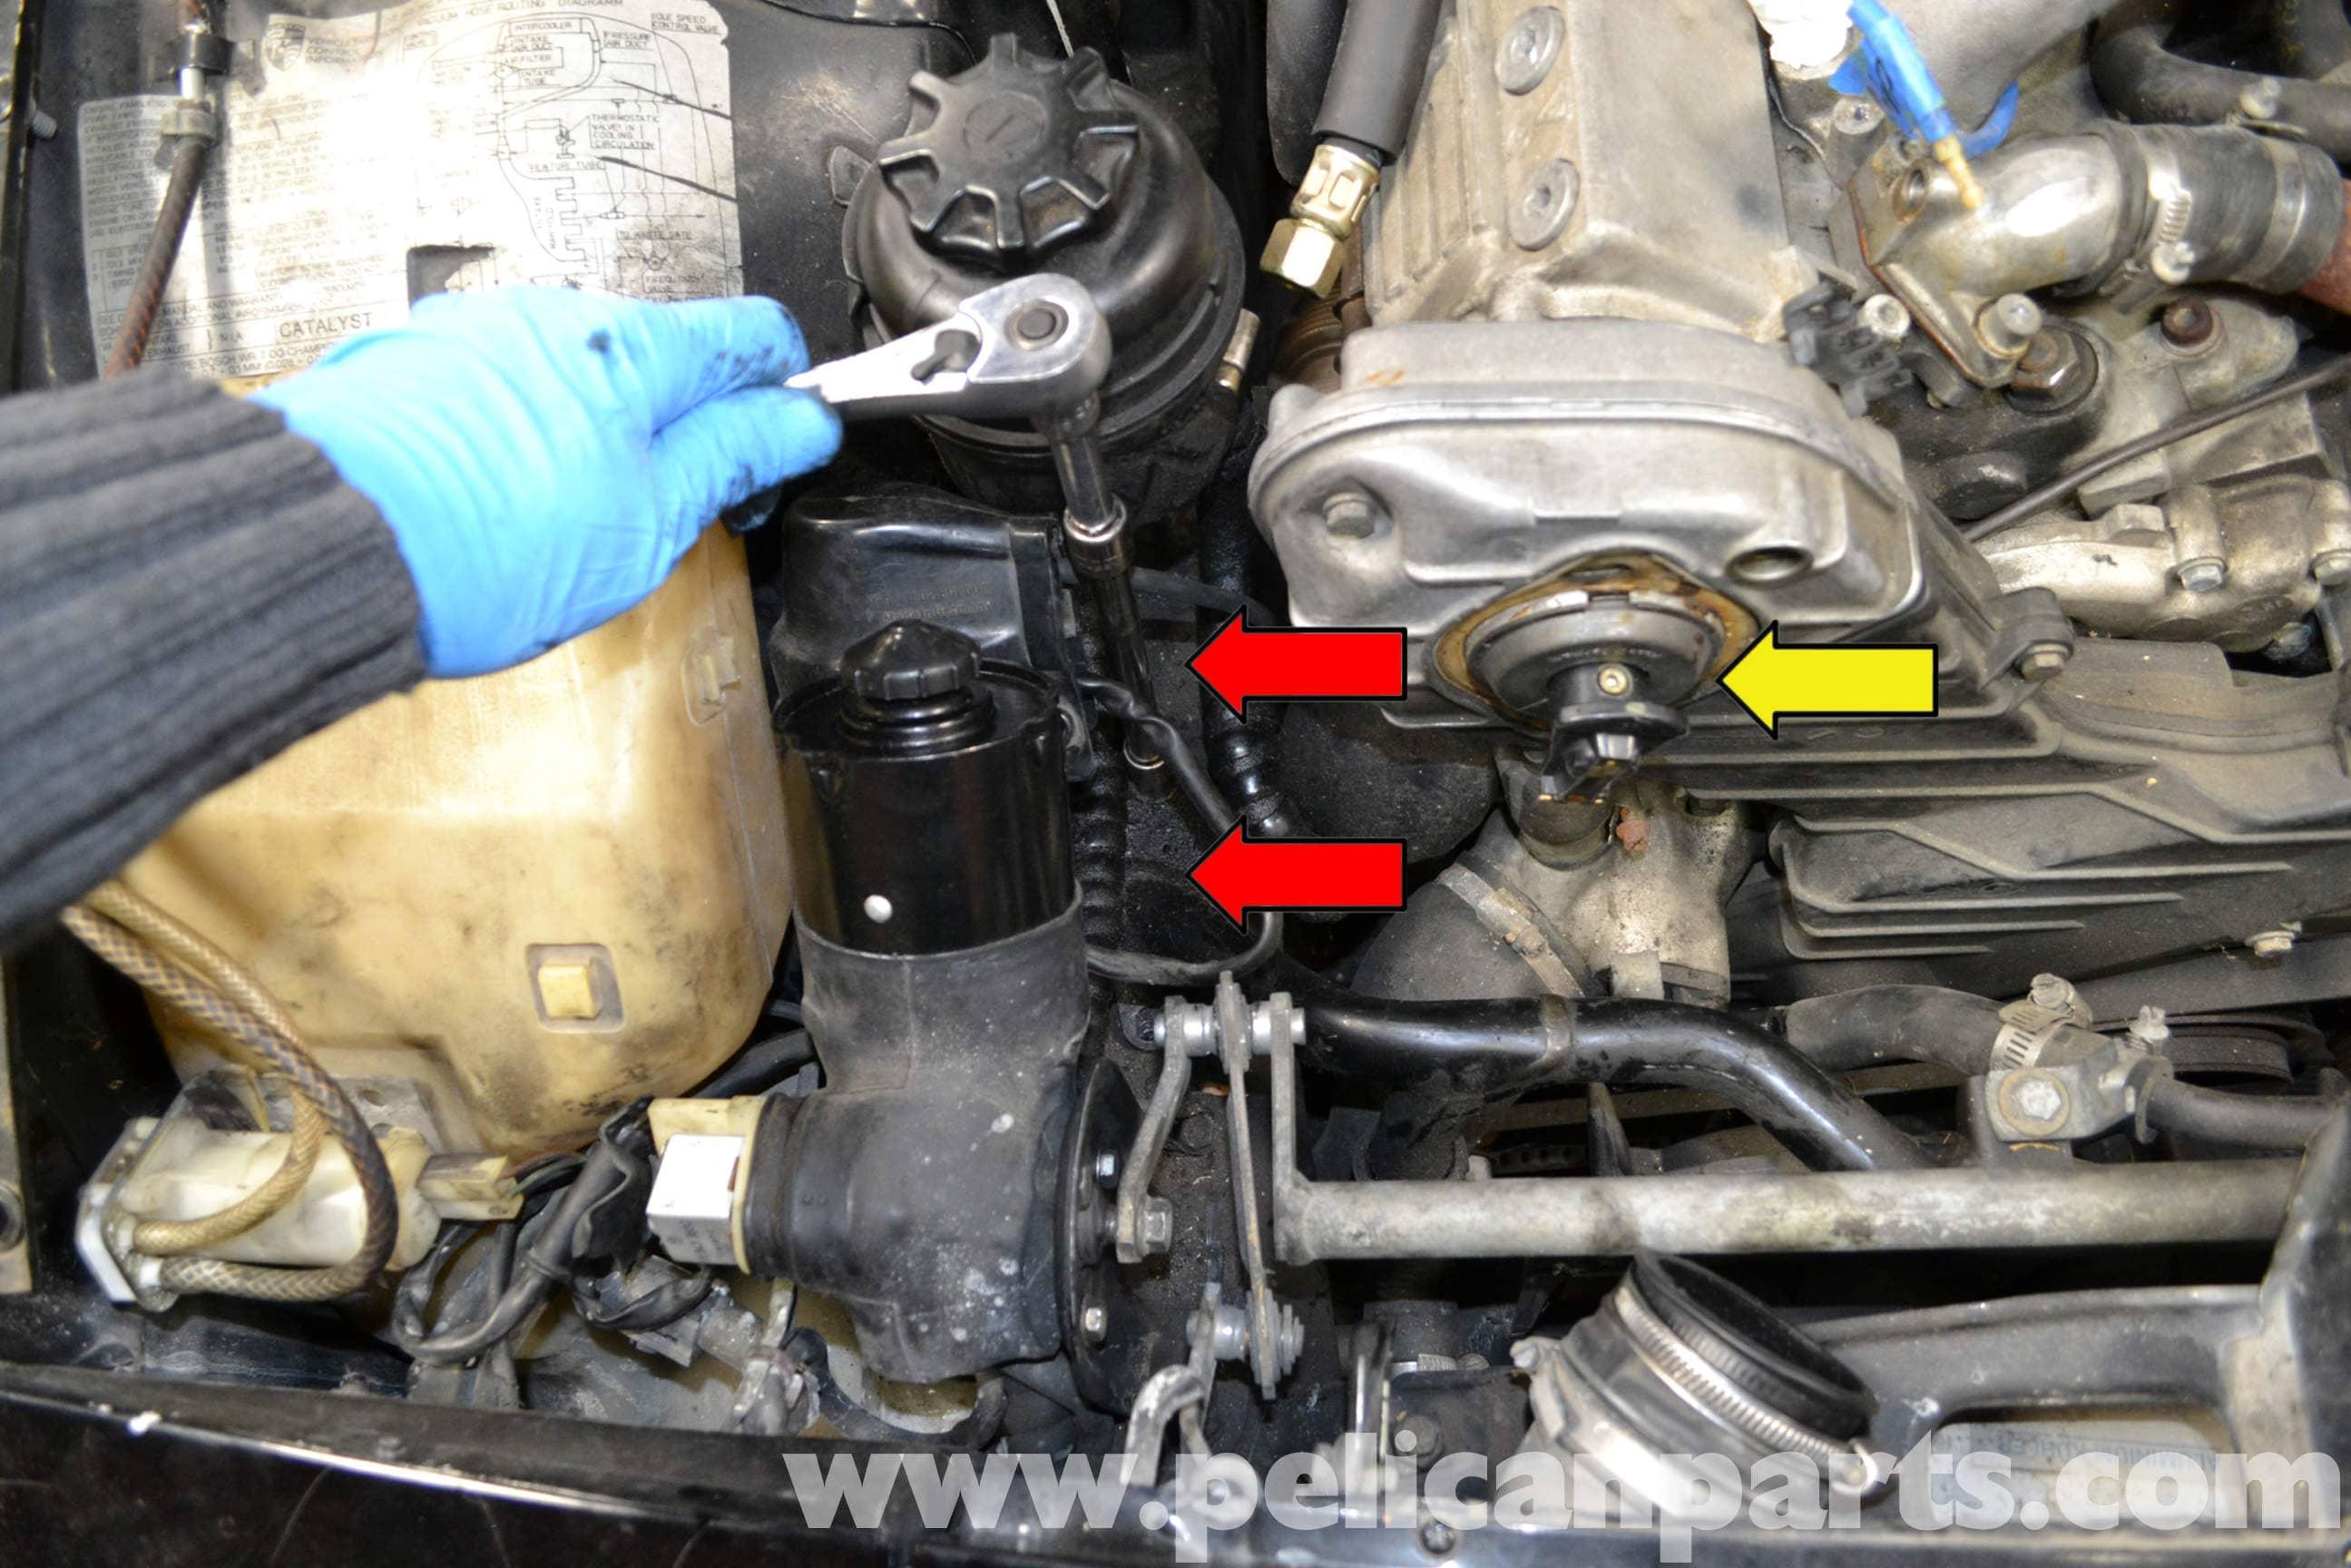 Corvette Wiper Motor Wiring Diagram Also 1987 Corvette Fuel Pump